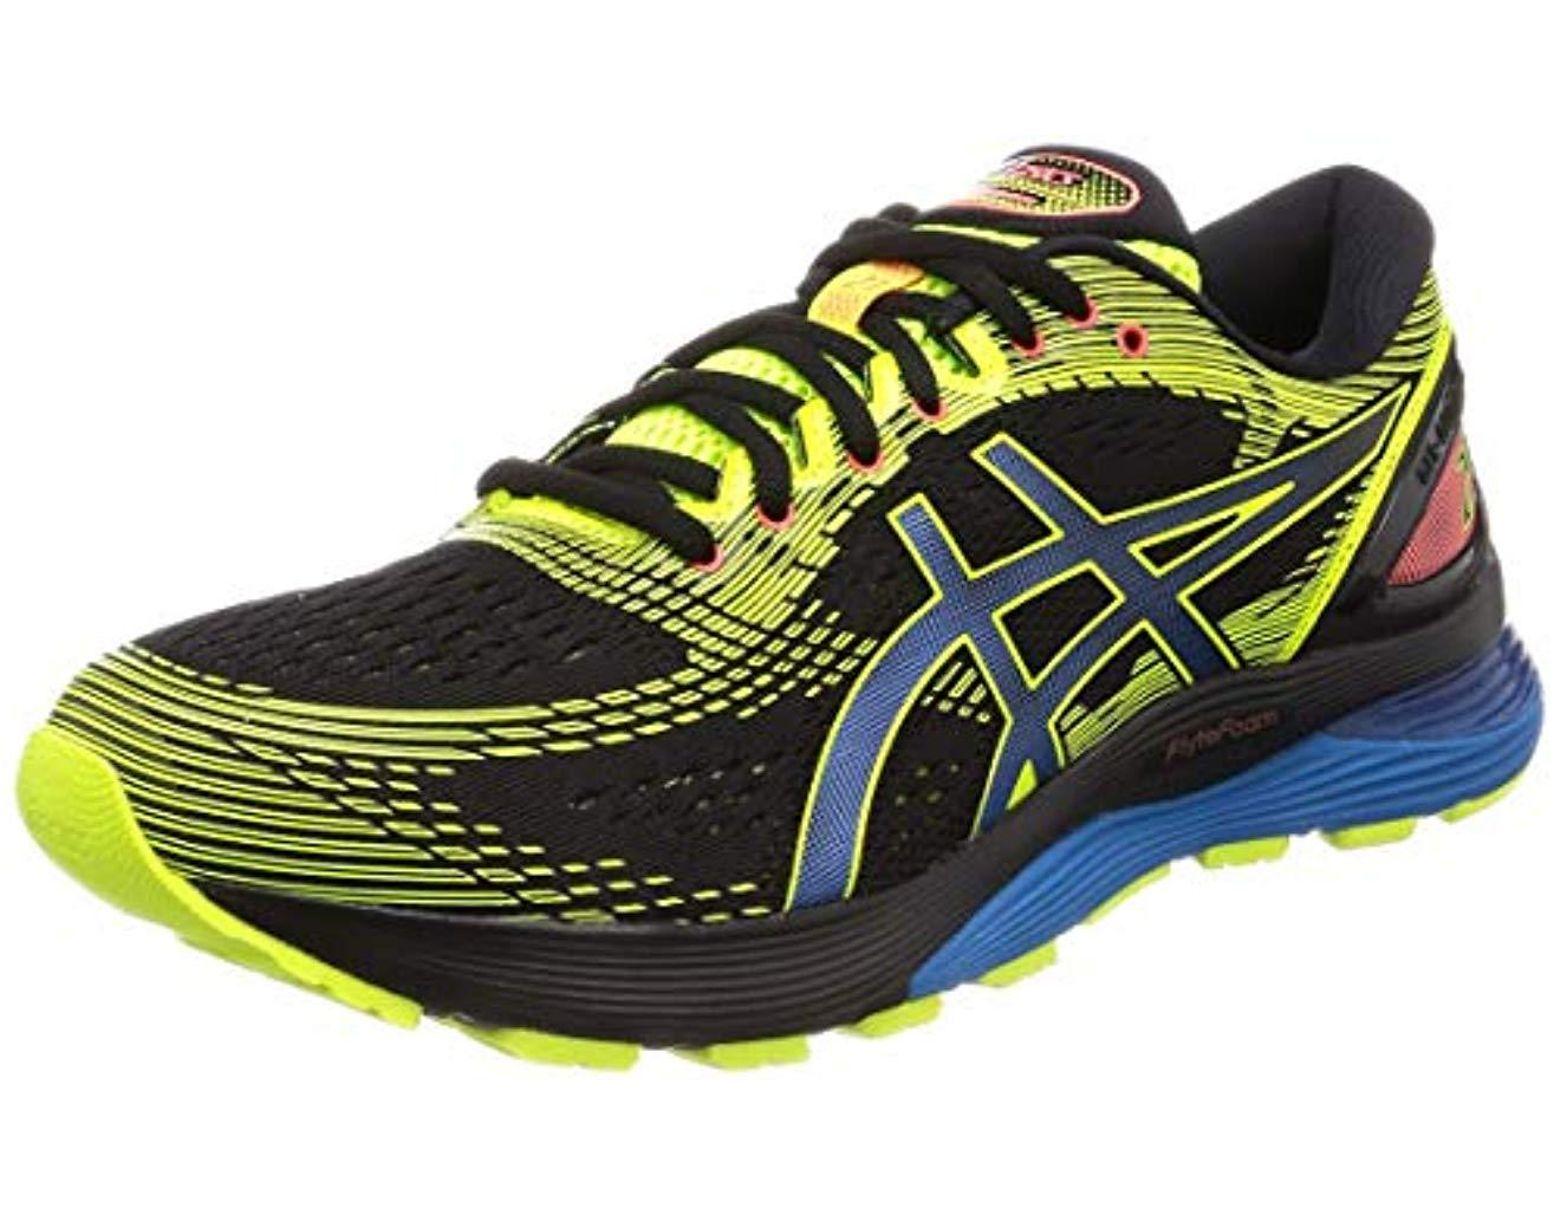 4f92dd0789 Asics Gel-nimbus 21 Sp Running Shoes in Black for Men - Save 15% - Lyst